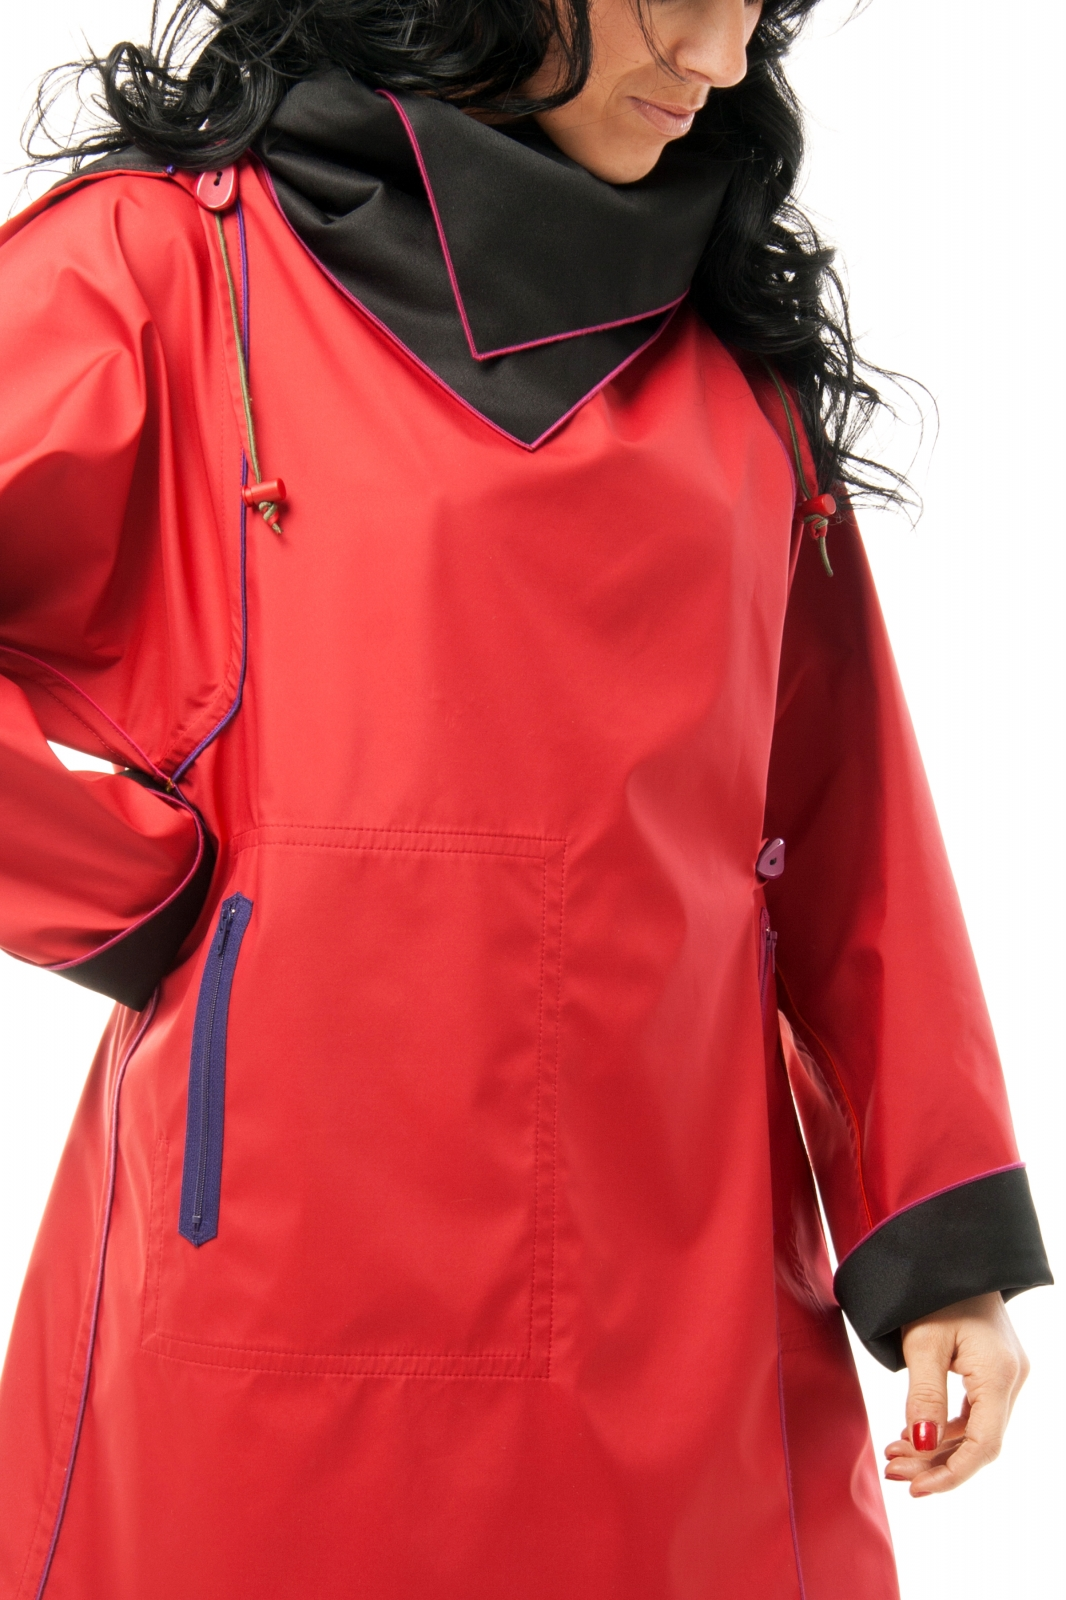 carmen g raincoats for women available online at jourdain